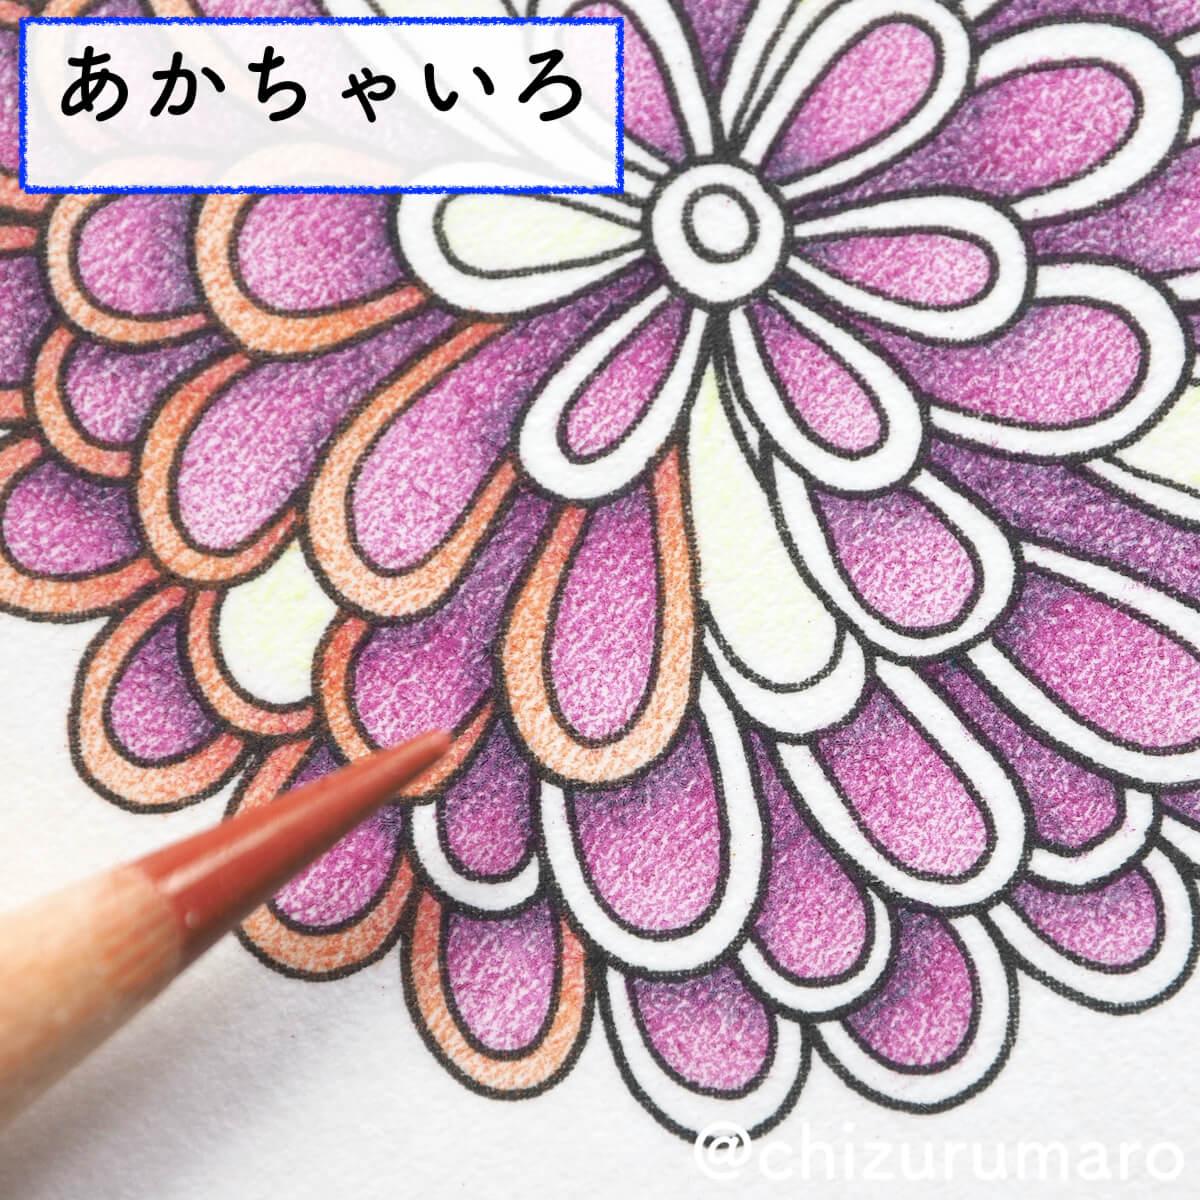 f:id:chizurumaro:20200422153043j:plain